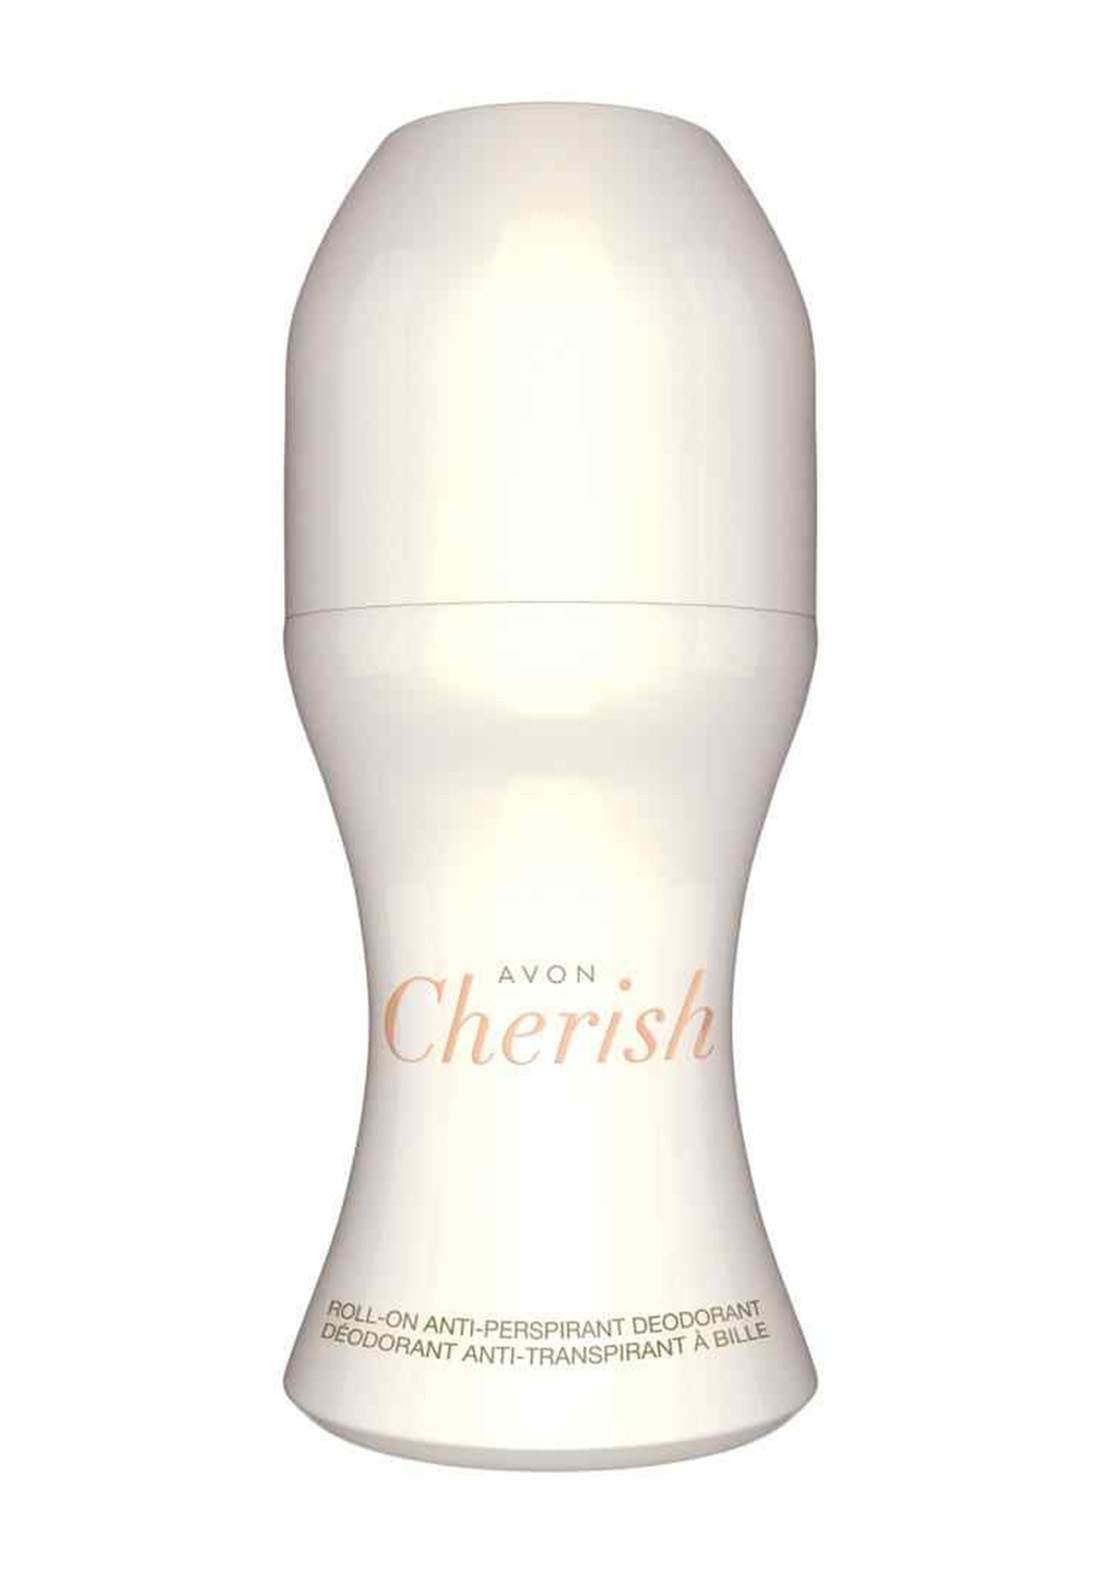 Avon 4554200 Cherish Roll-On Deodorant for Women 50ml مزيل عرق